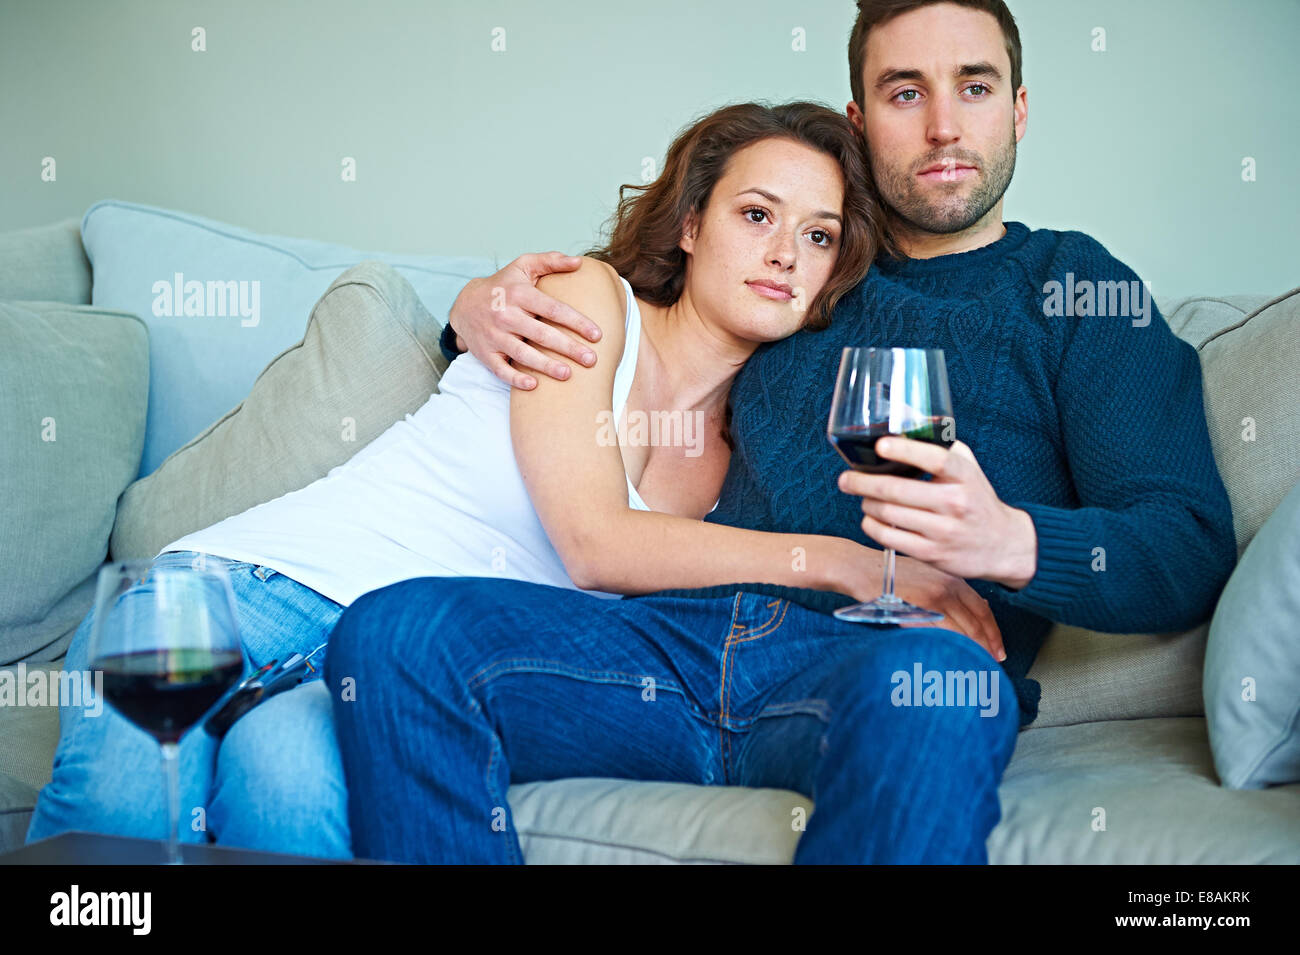 Couple enjoying wine sur canapé Photo Stock